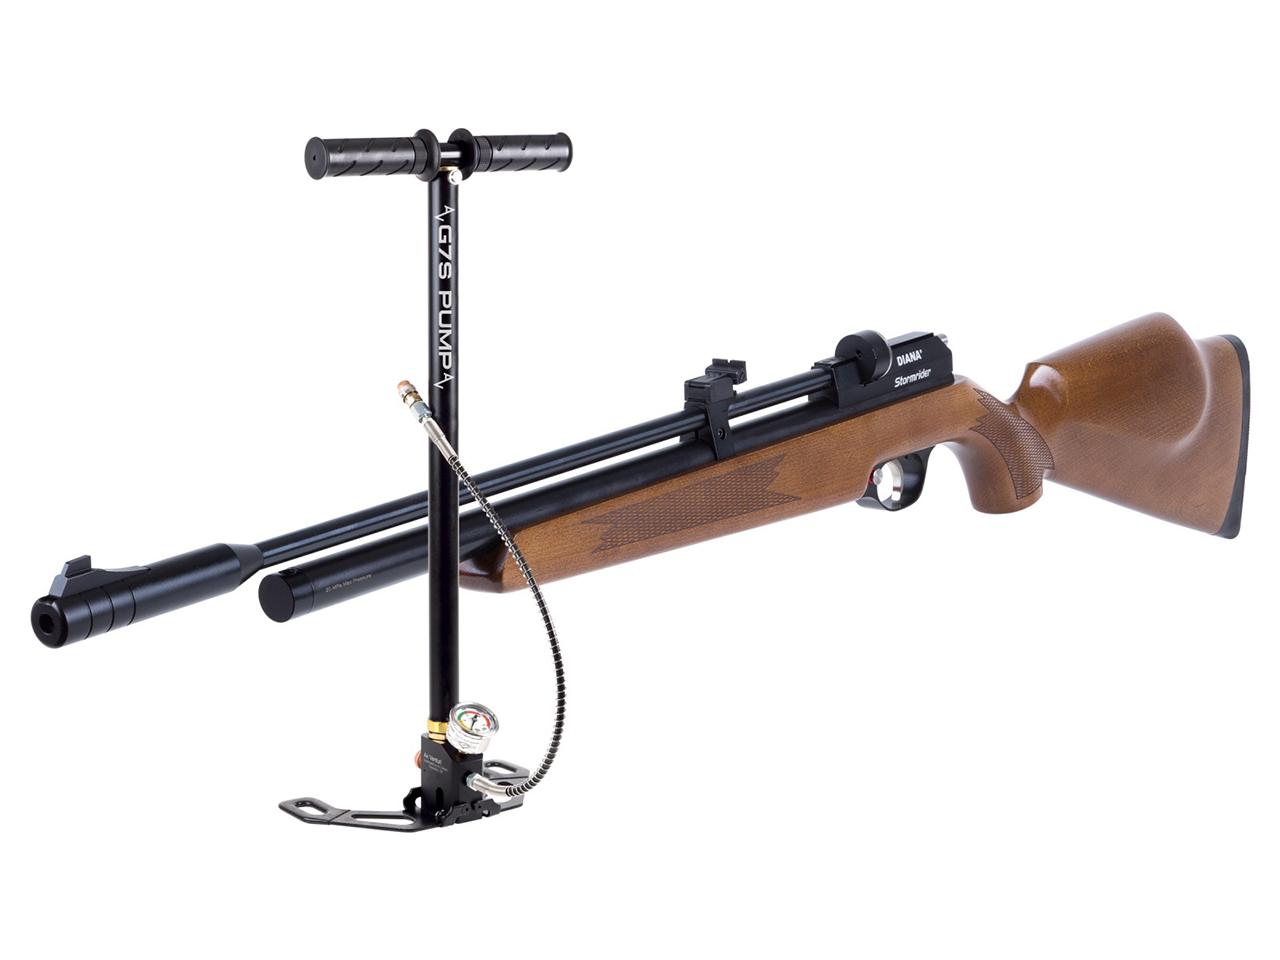 Diana Stormrider PCP Pellet Rifle and Pump Combo